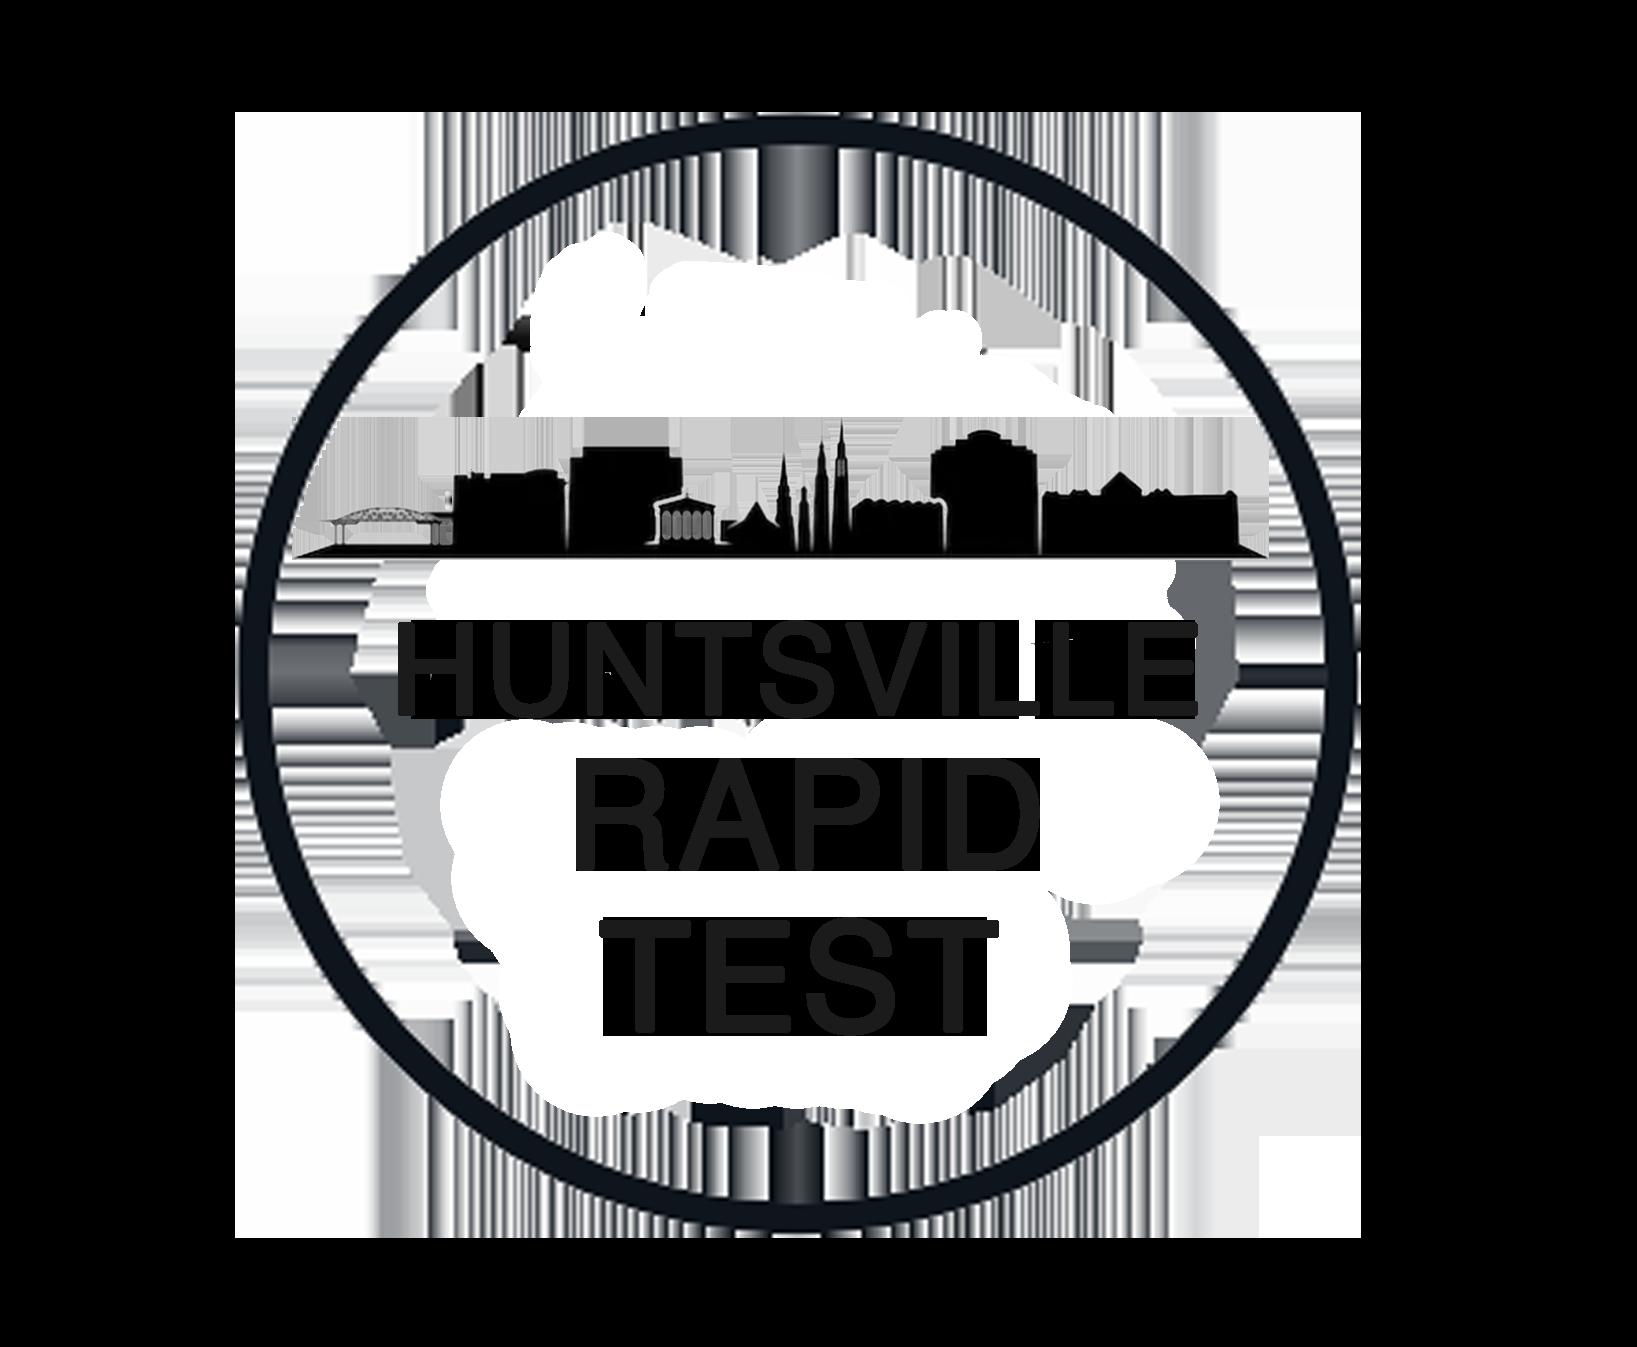 Huntsville Rapid Test logo